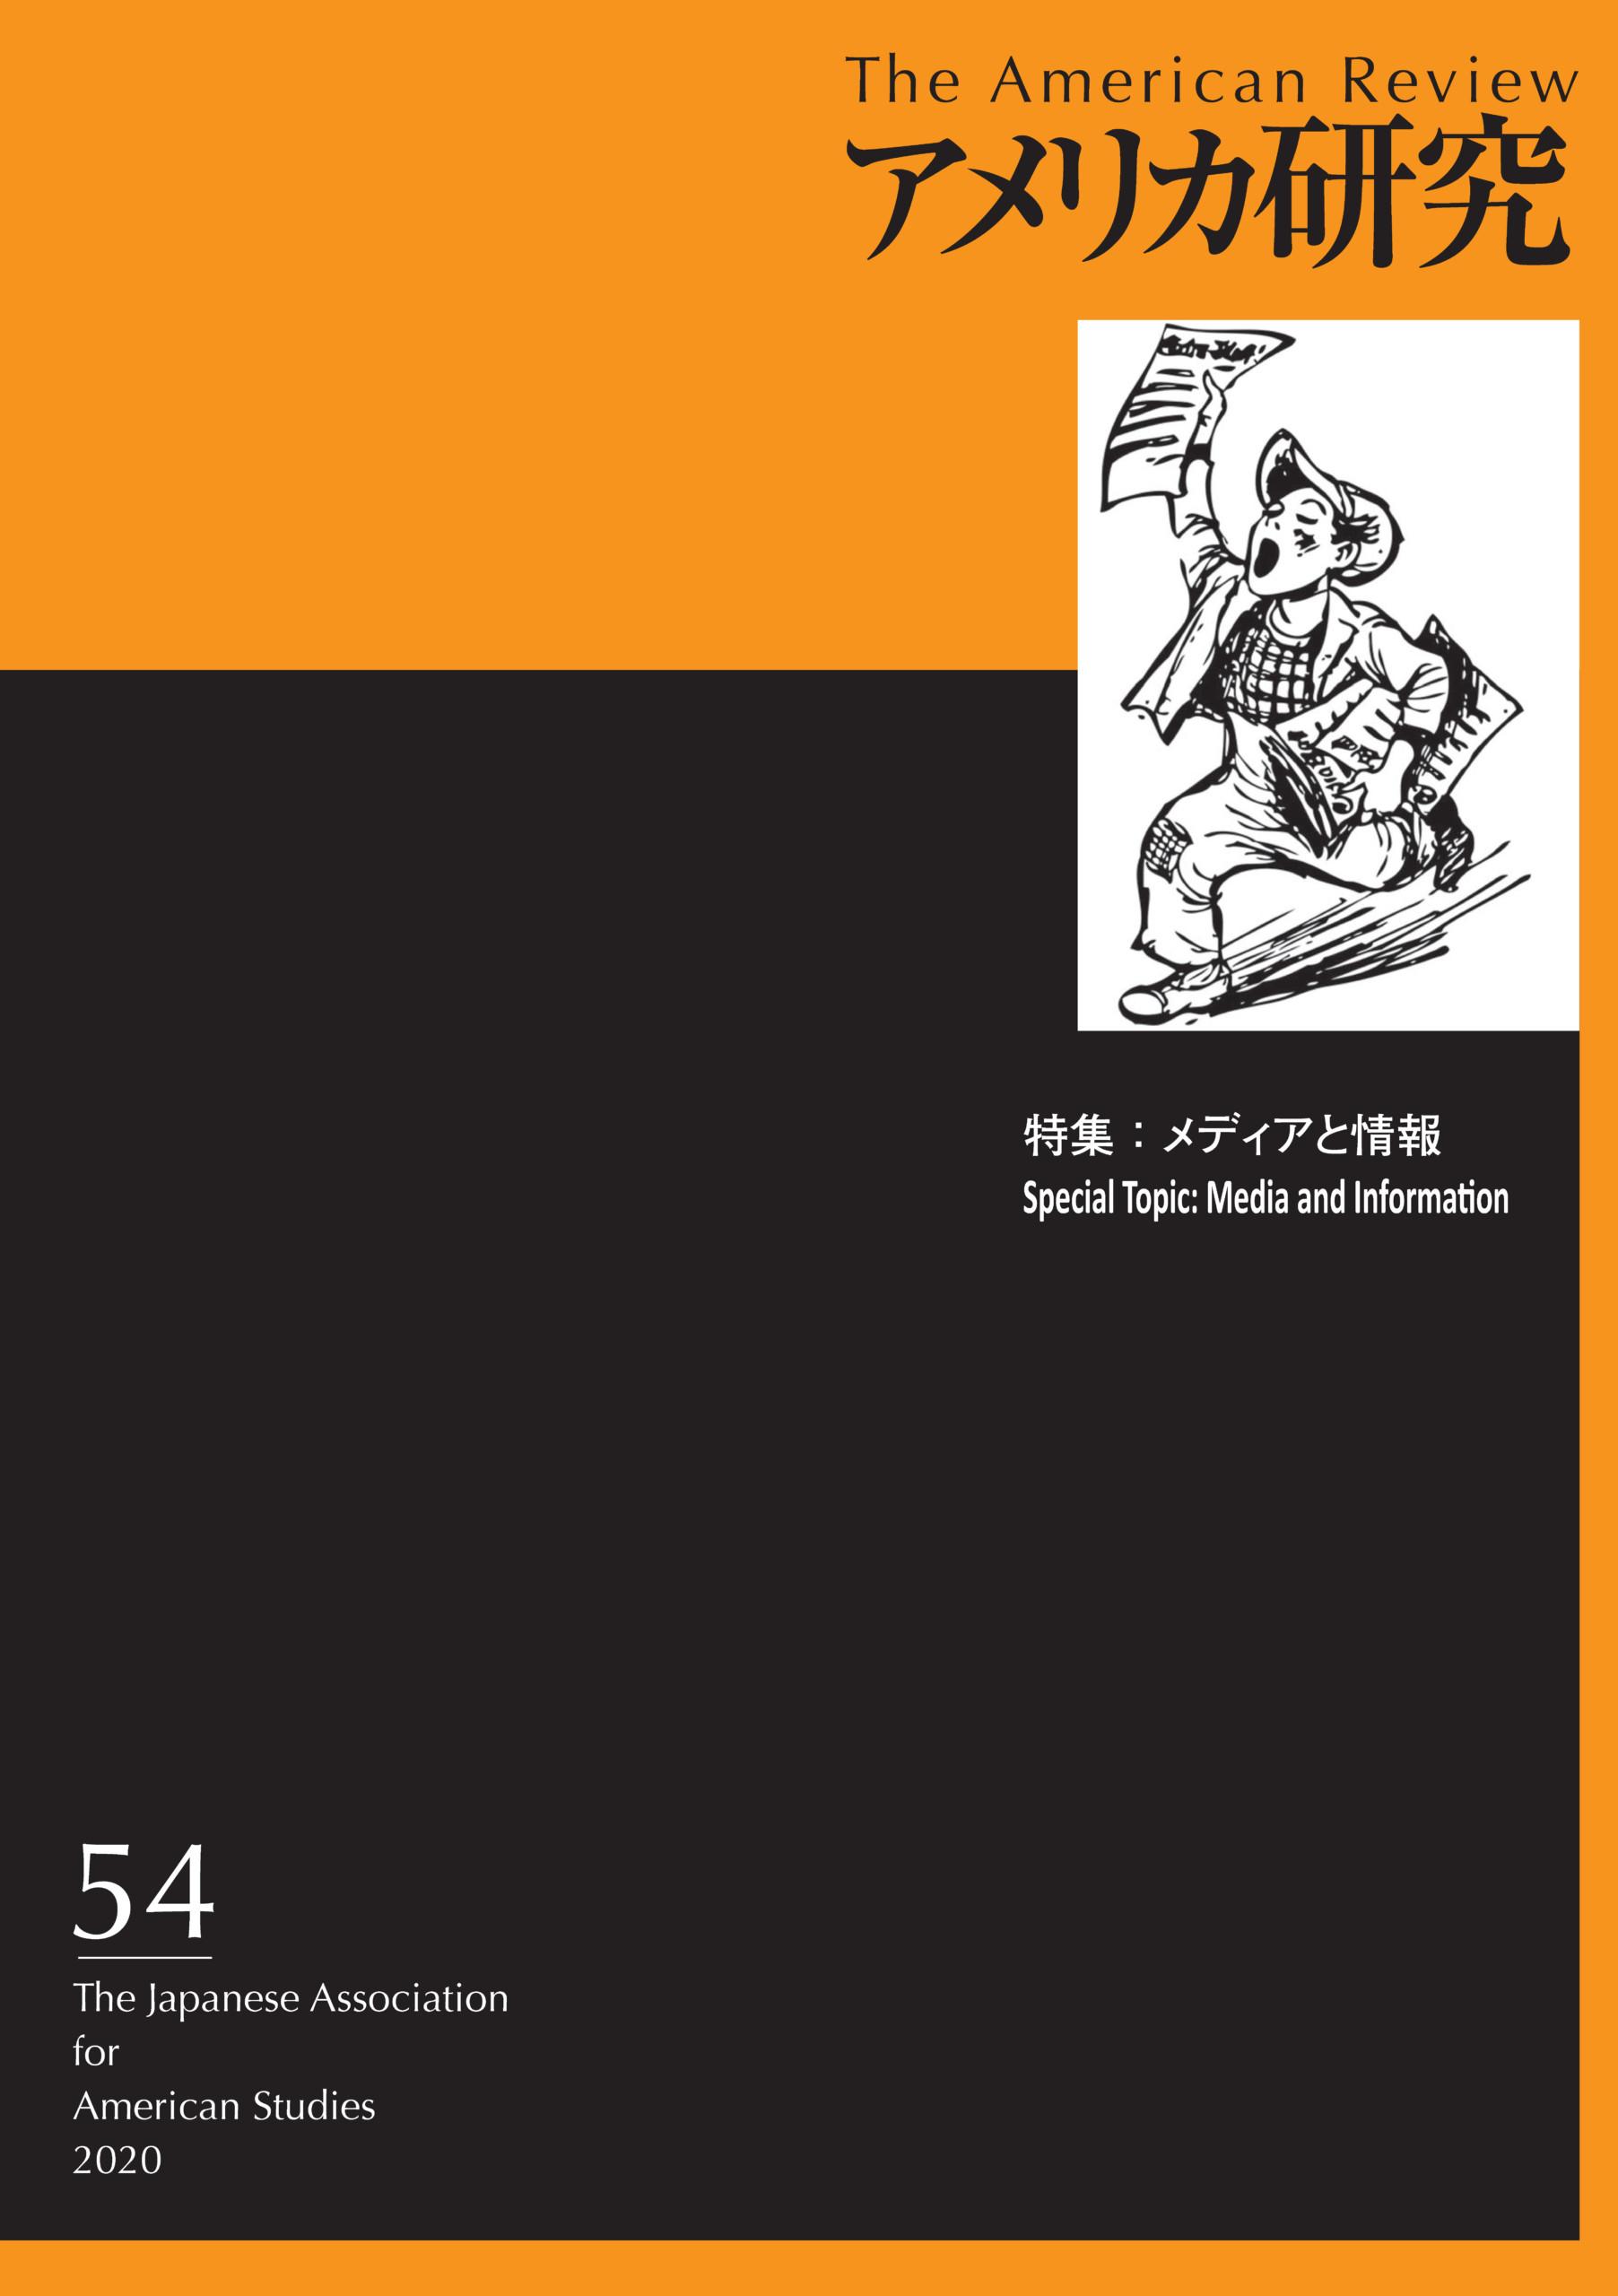 978-4-902590-89-0